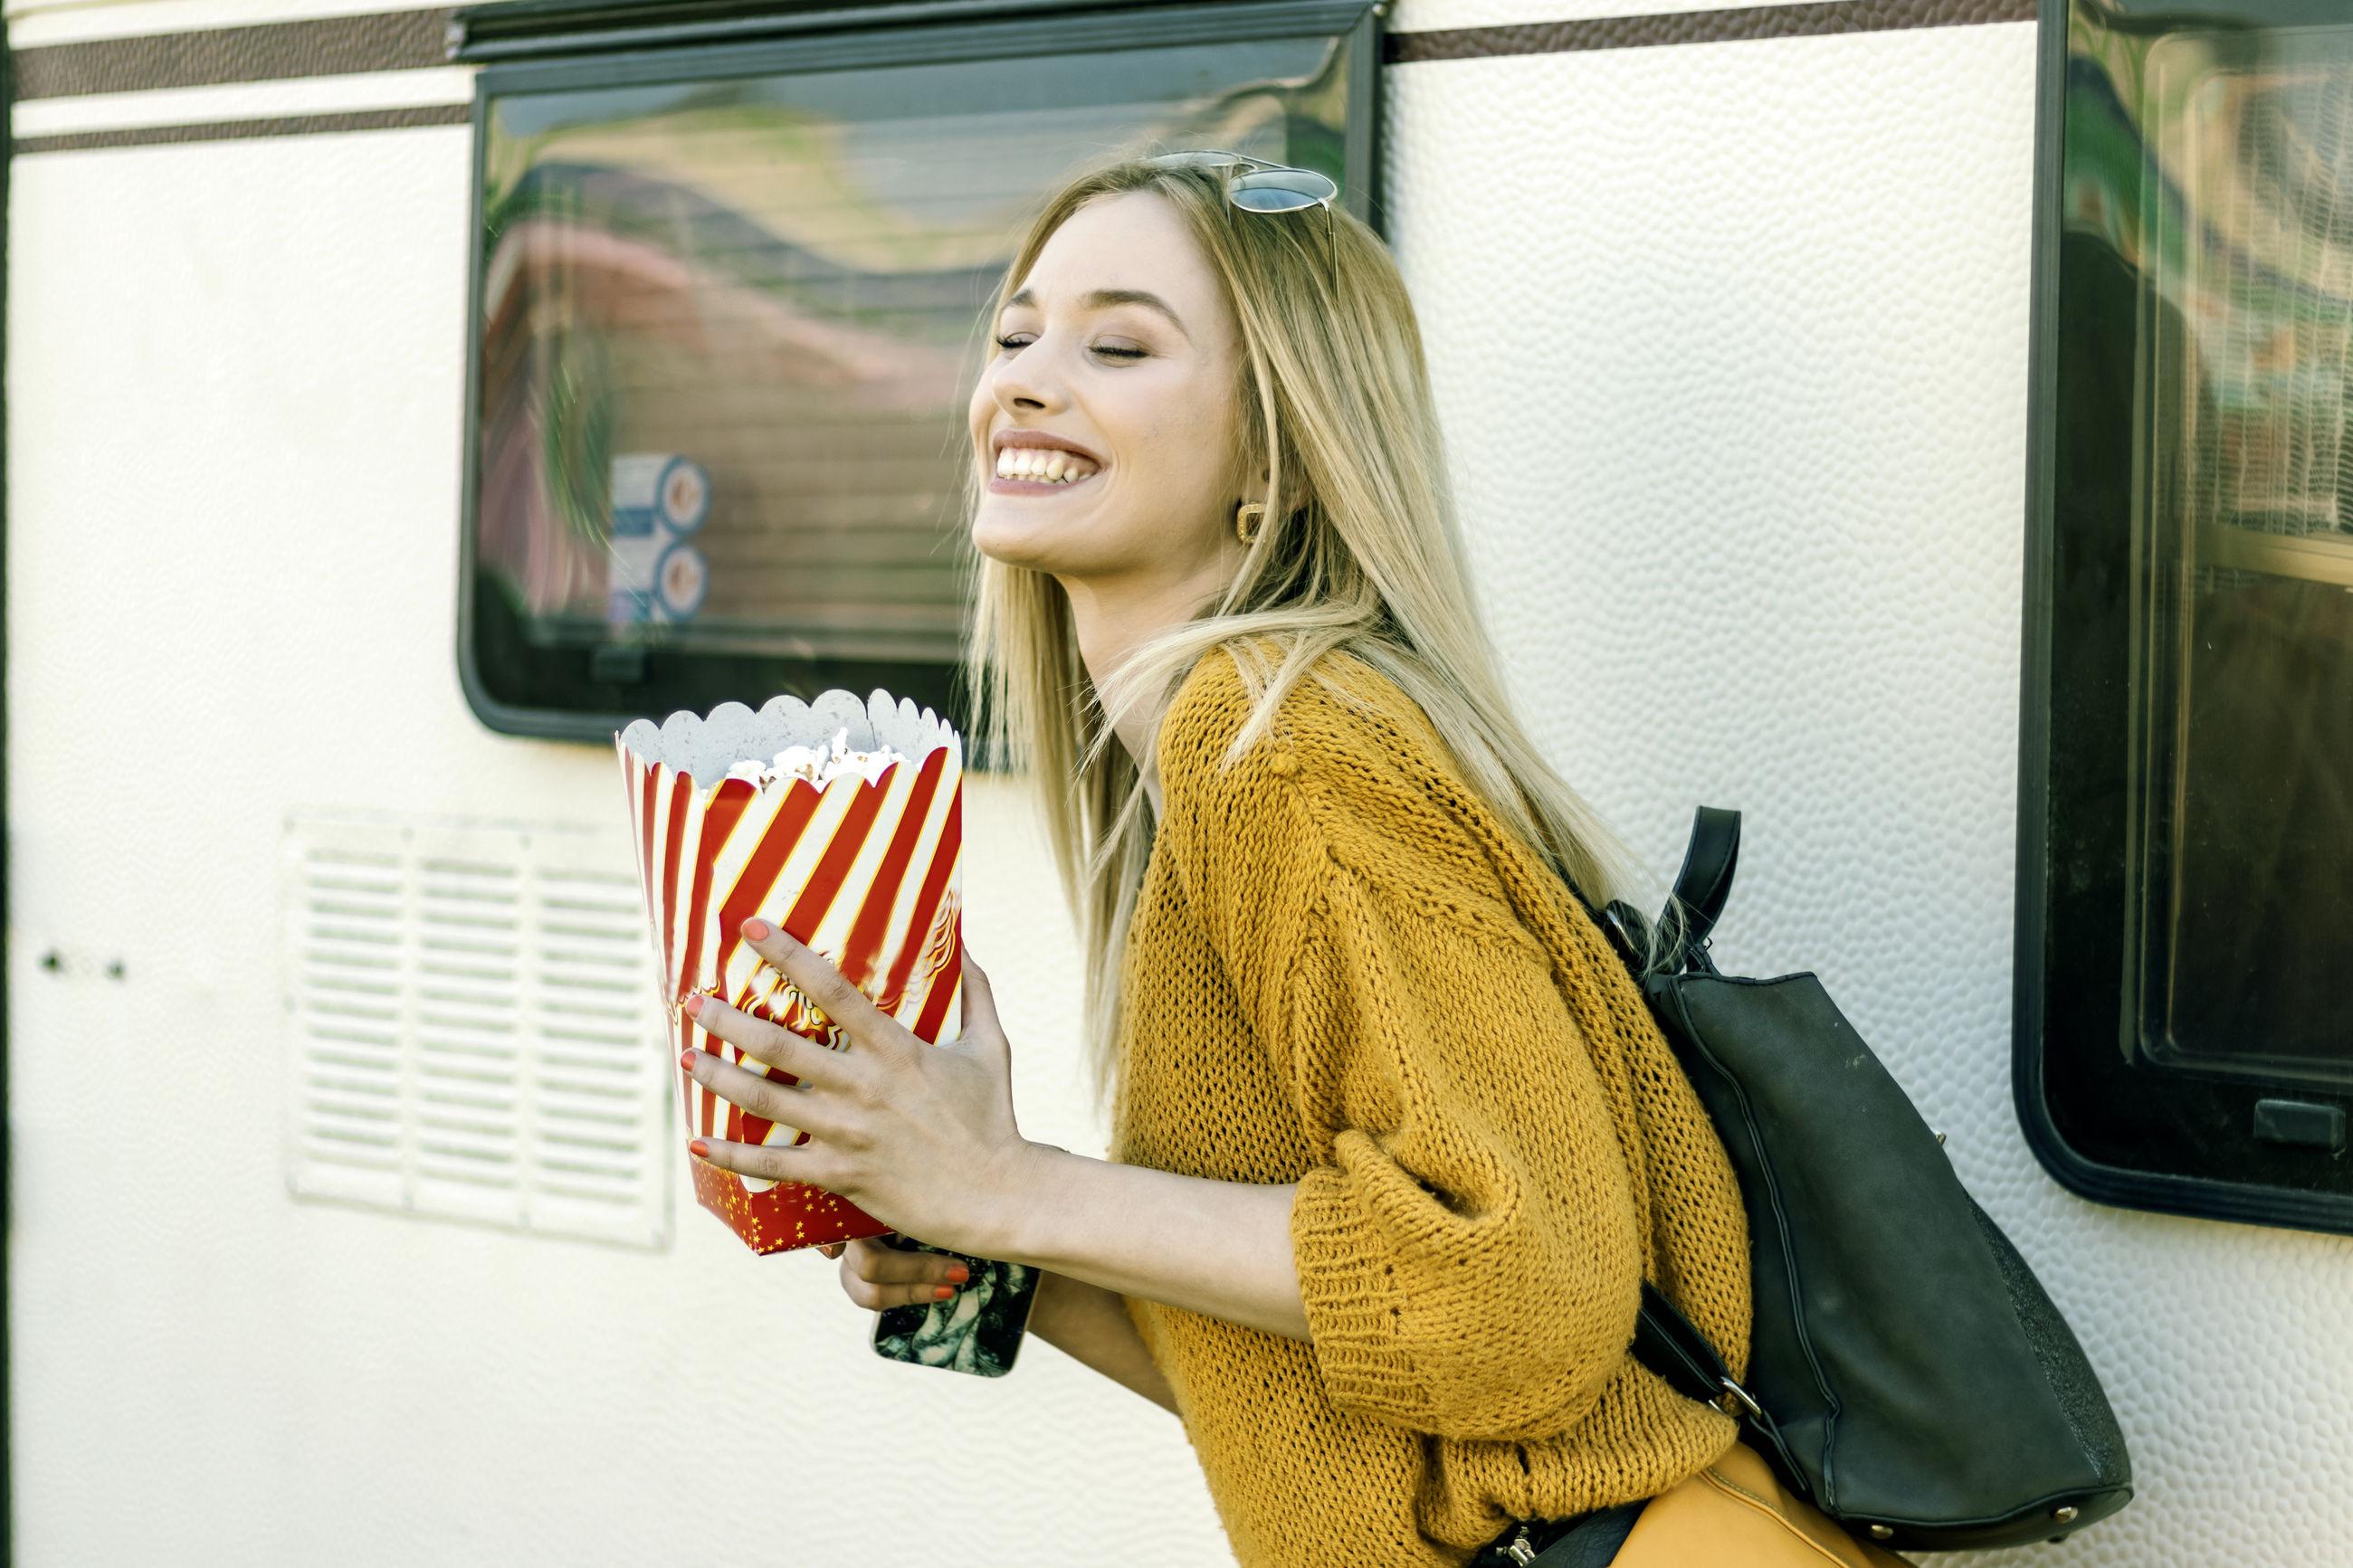 Smiling woman having popcorn in city